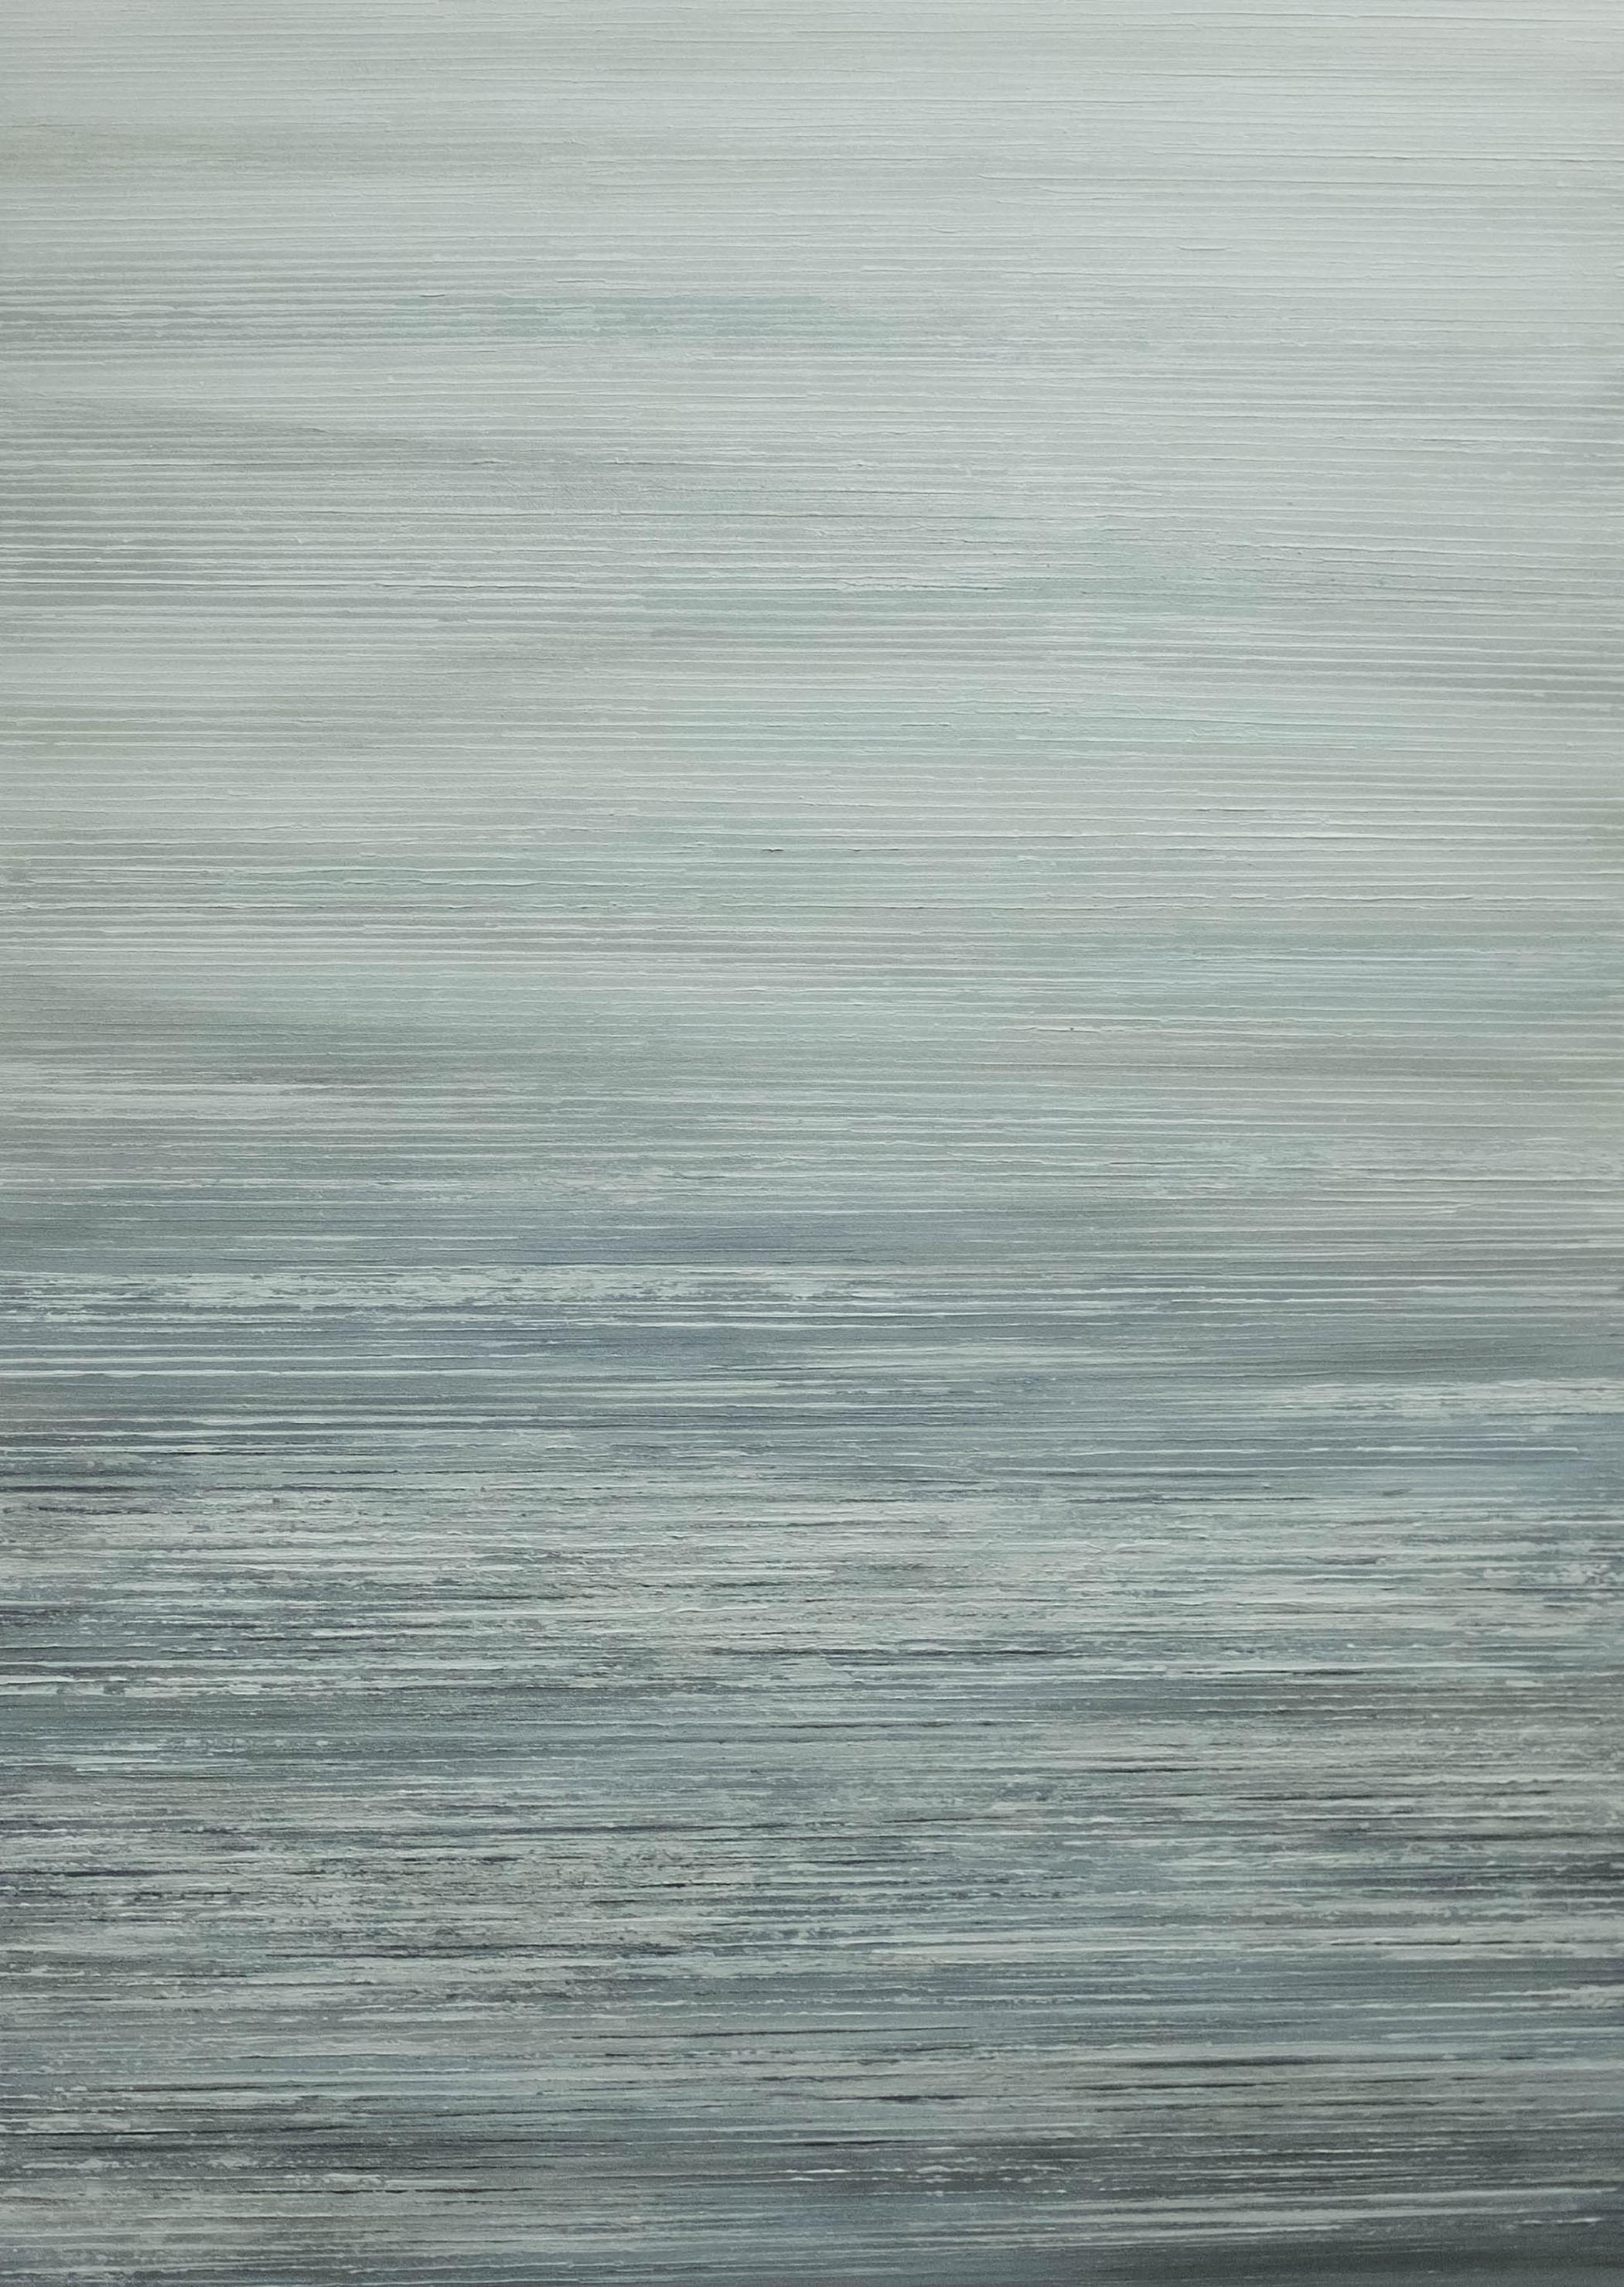 Seascape - V - Ivory/Grey - 2015